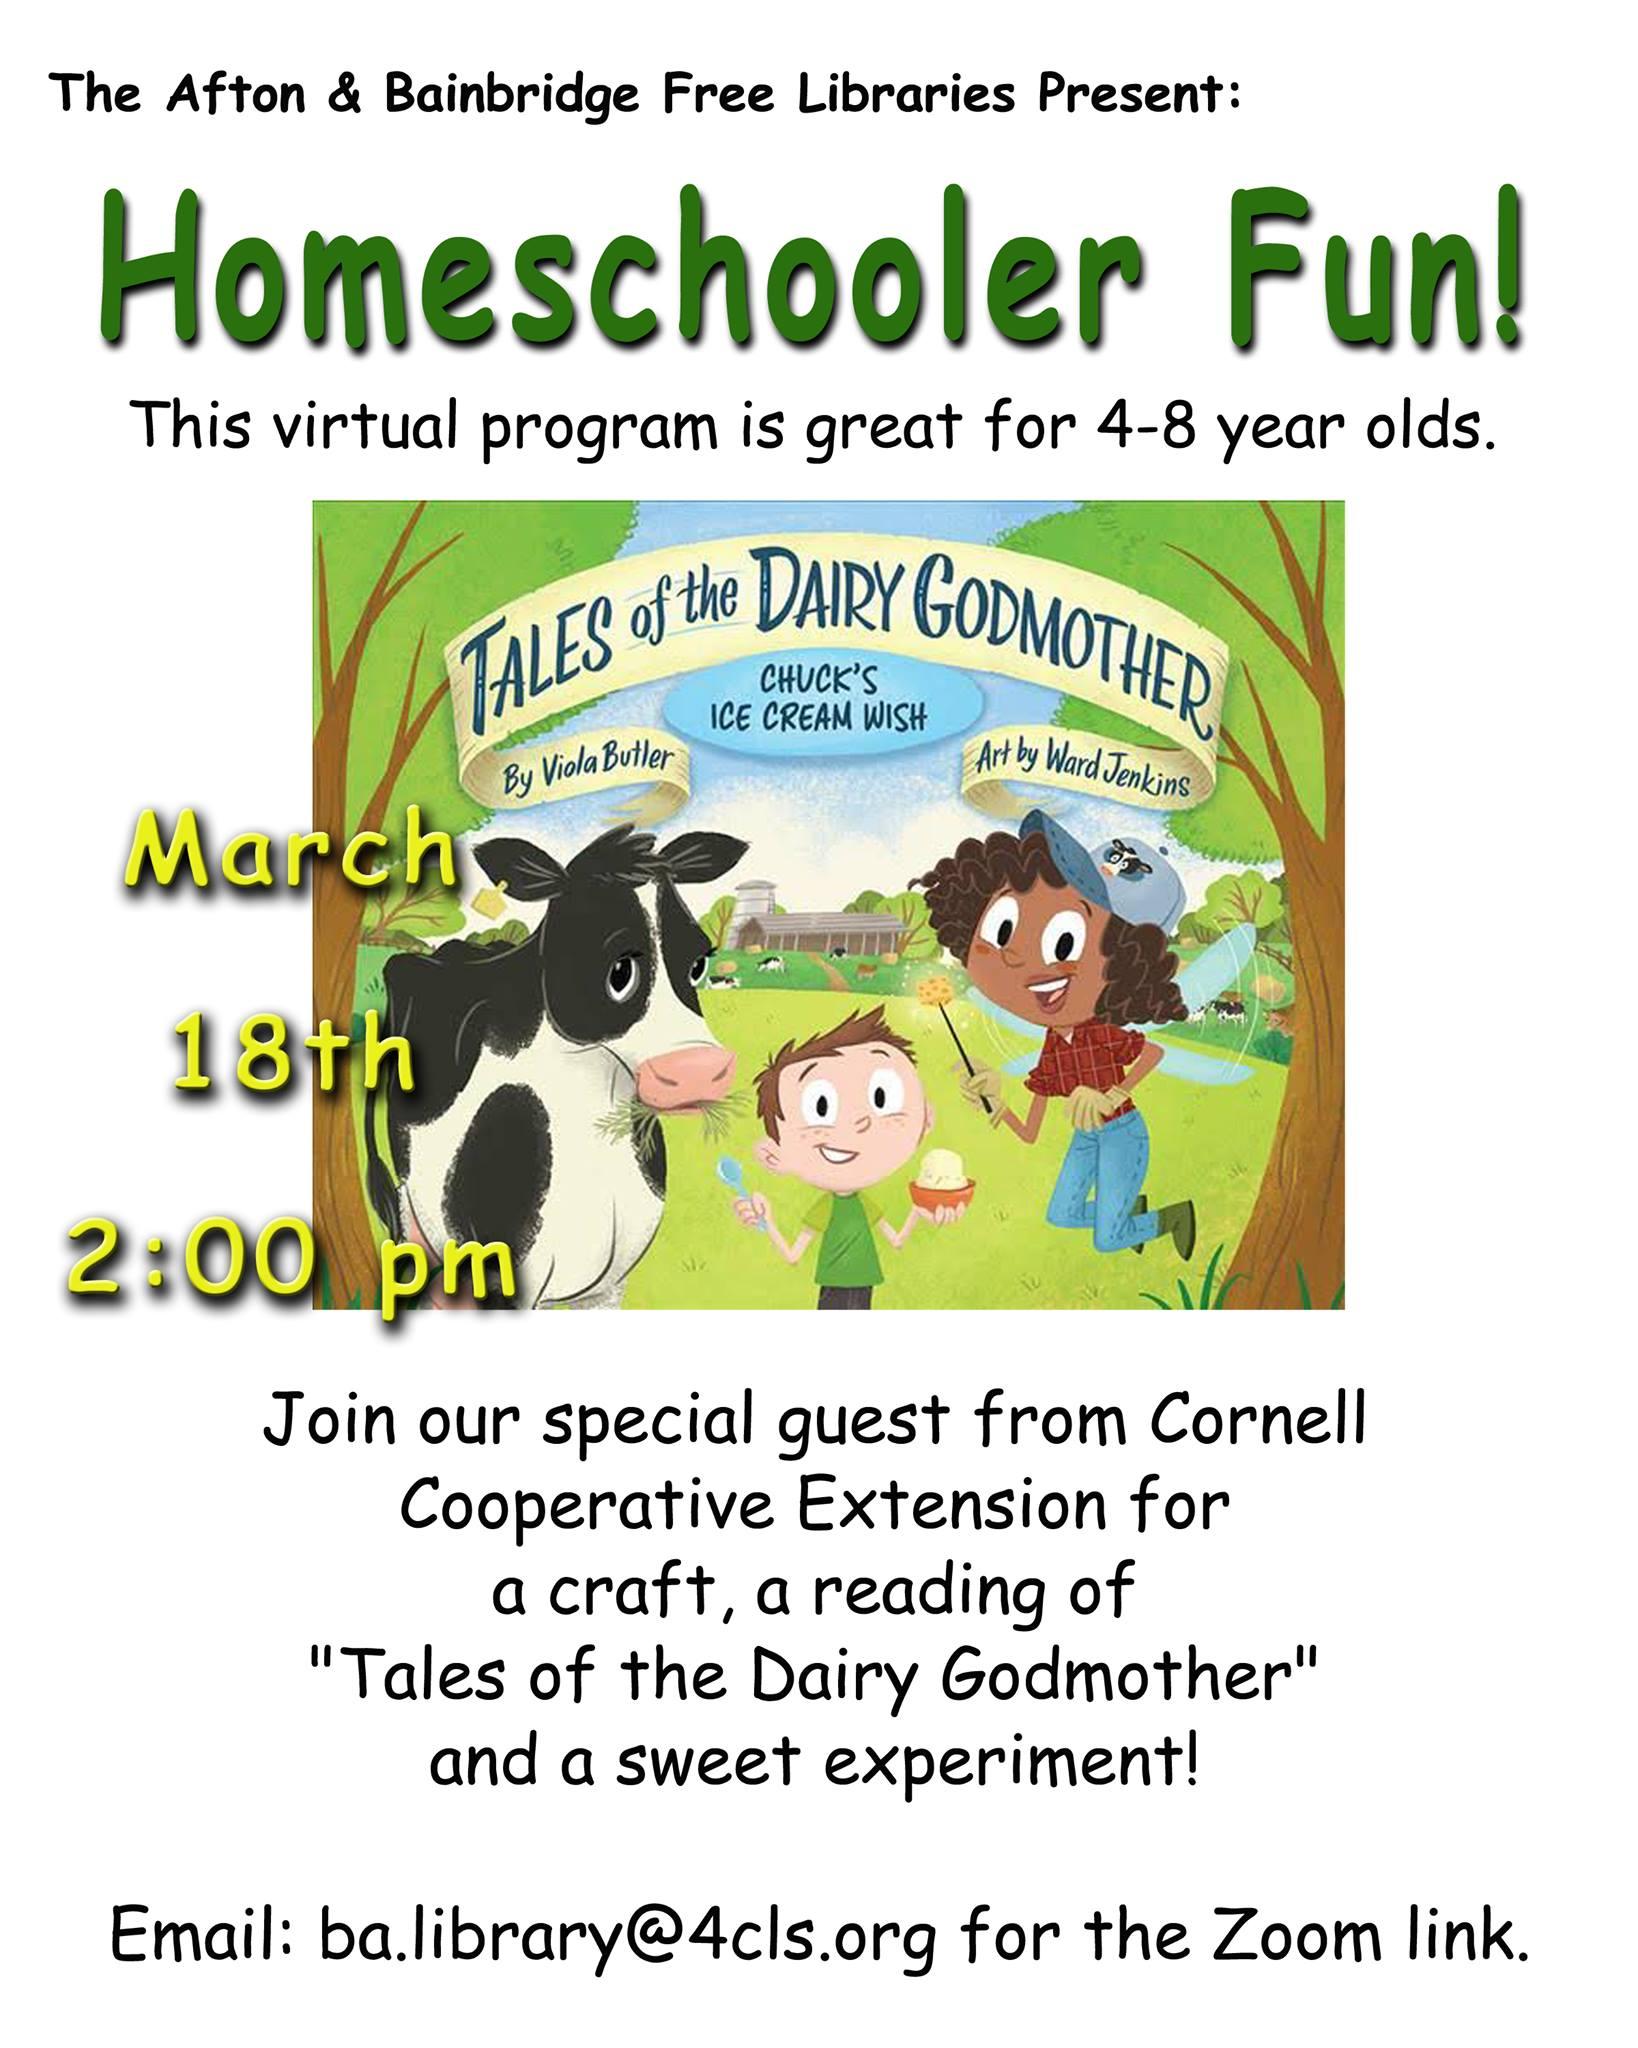 Homeschooler Fun! – March 18